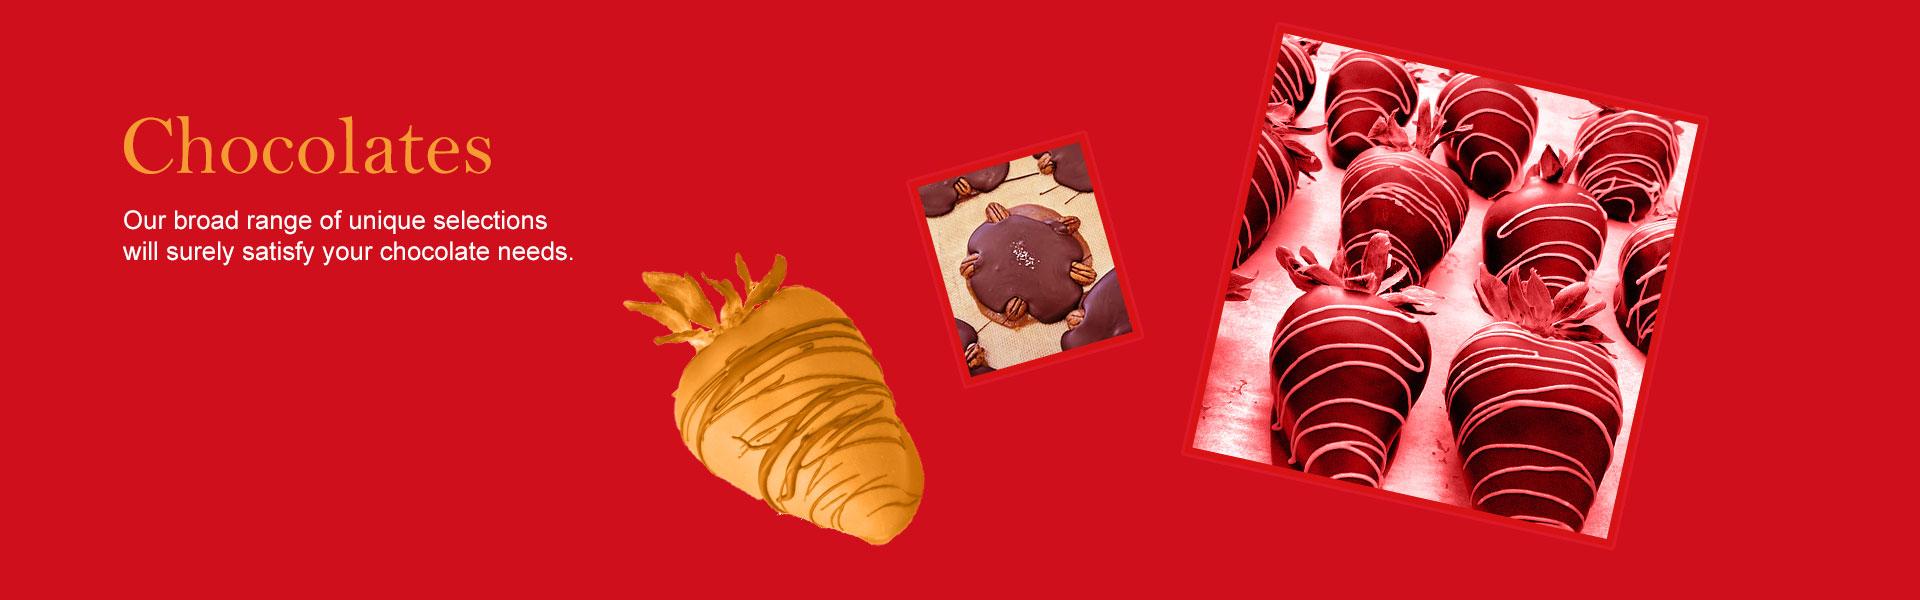 garza_slide_chocolates